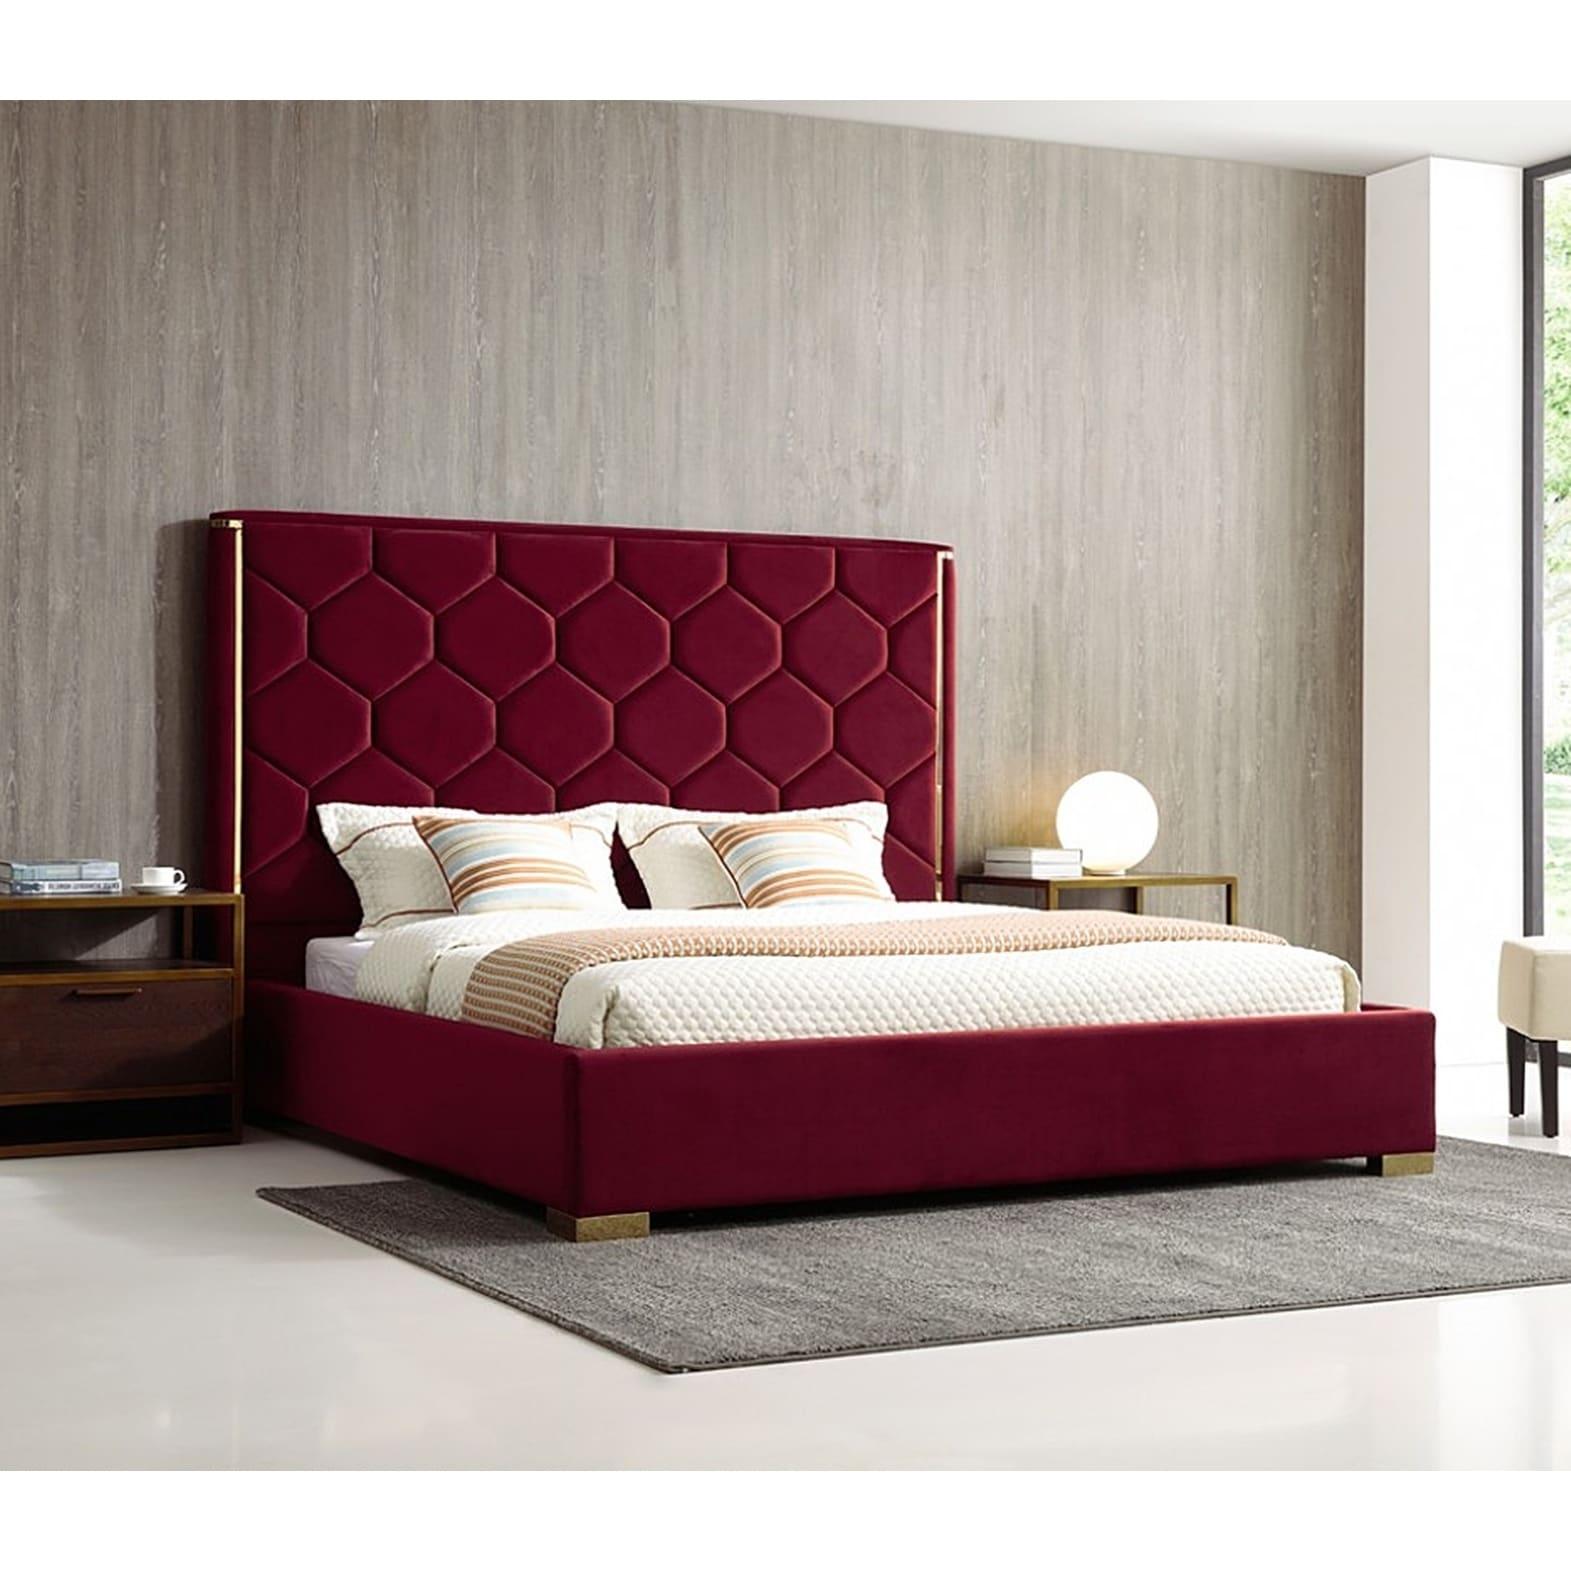 Blauvelt Queen Size Red Velvet Upholstered Platform Bed With Gold Accents On Sale Overstock 27129638